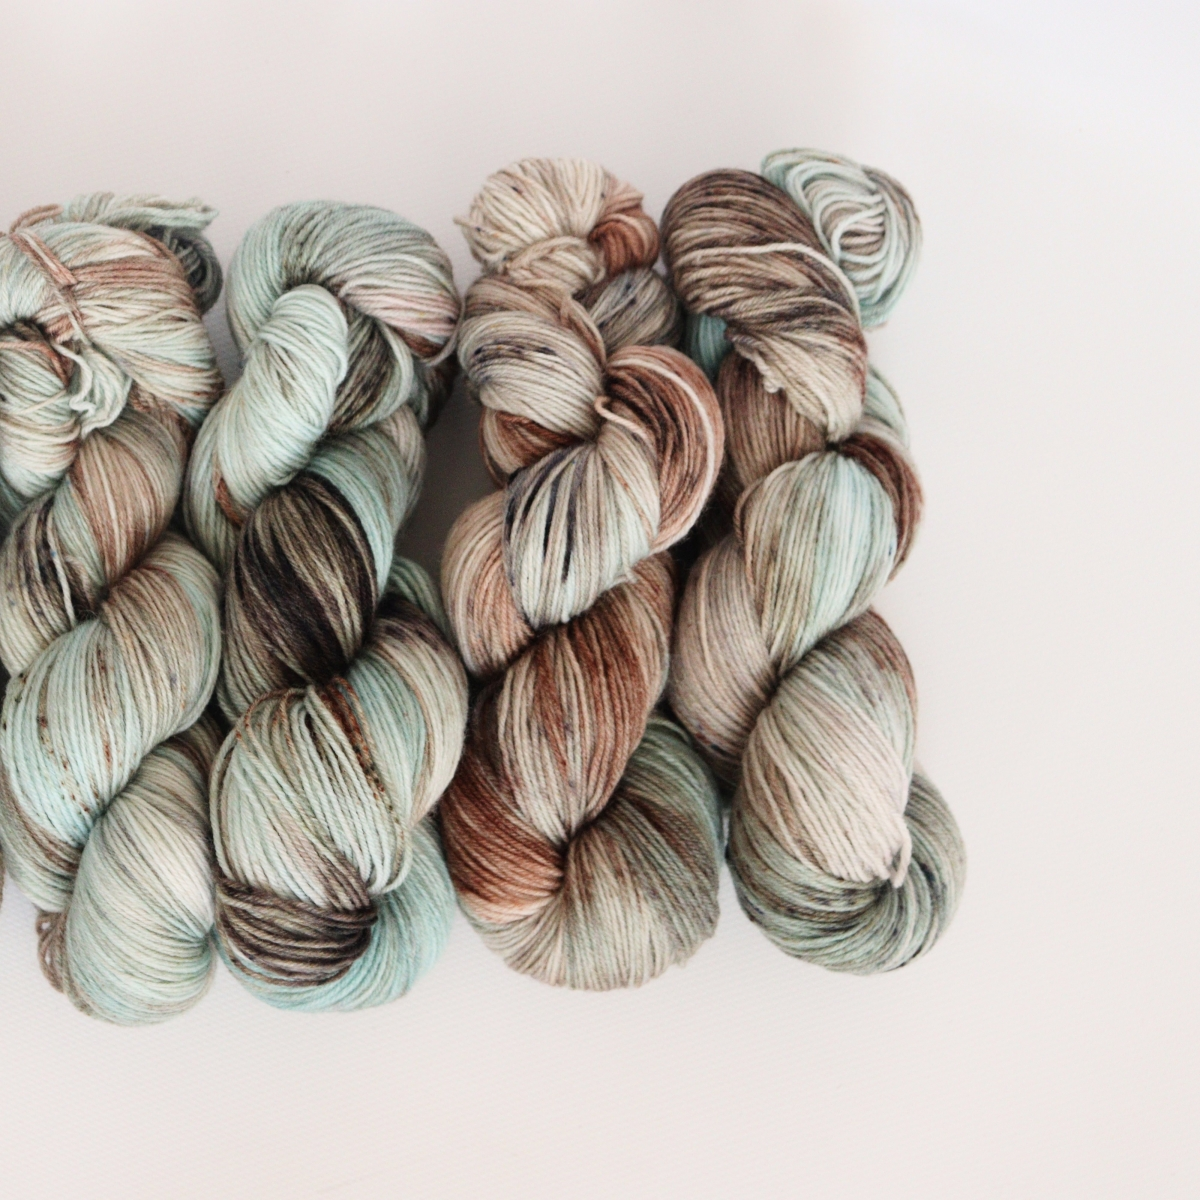 woodico.pro hand dyed yarn 055 1 1200x1200 - Hand dyed yarn / 055